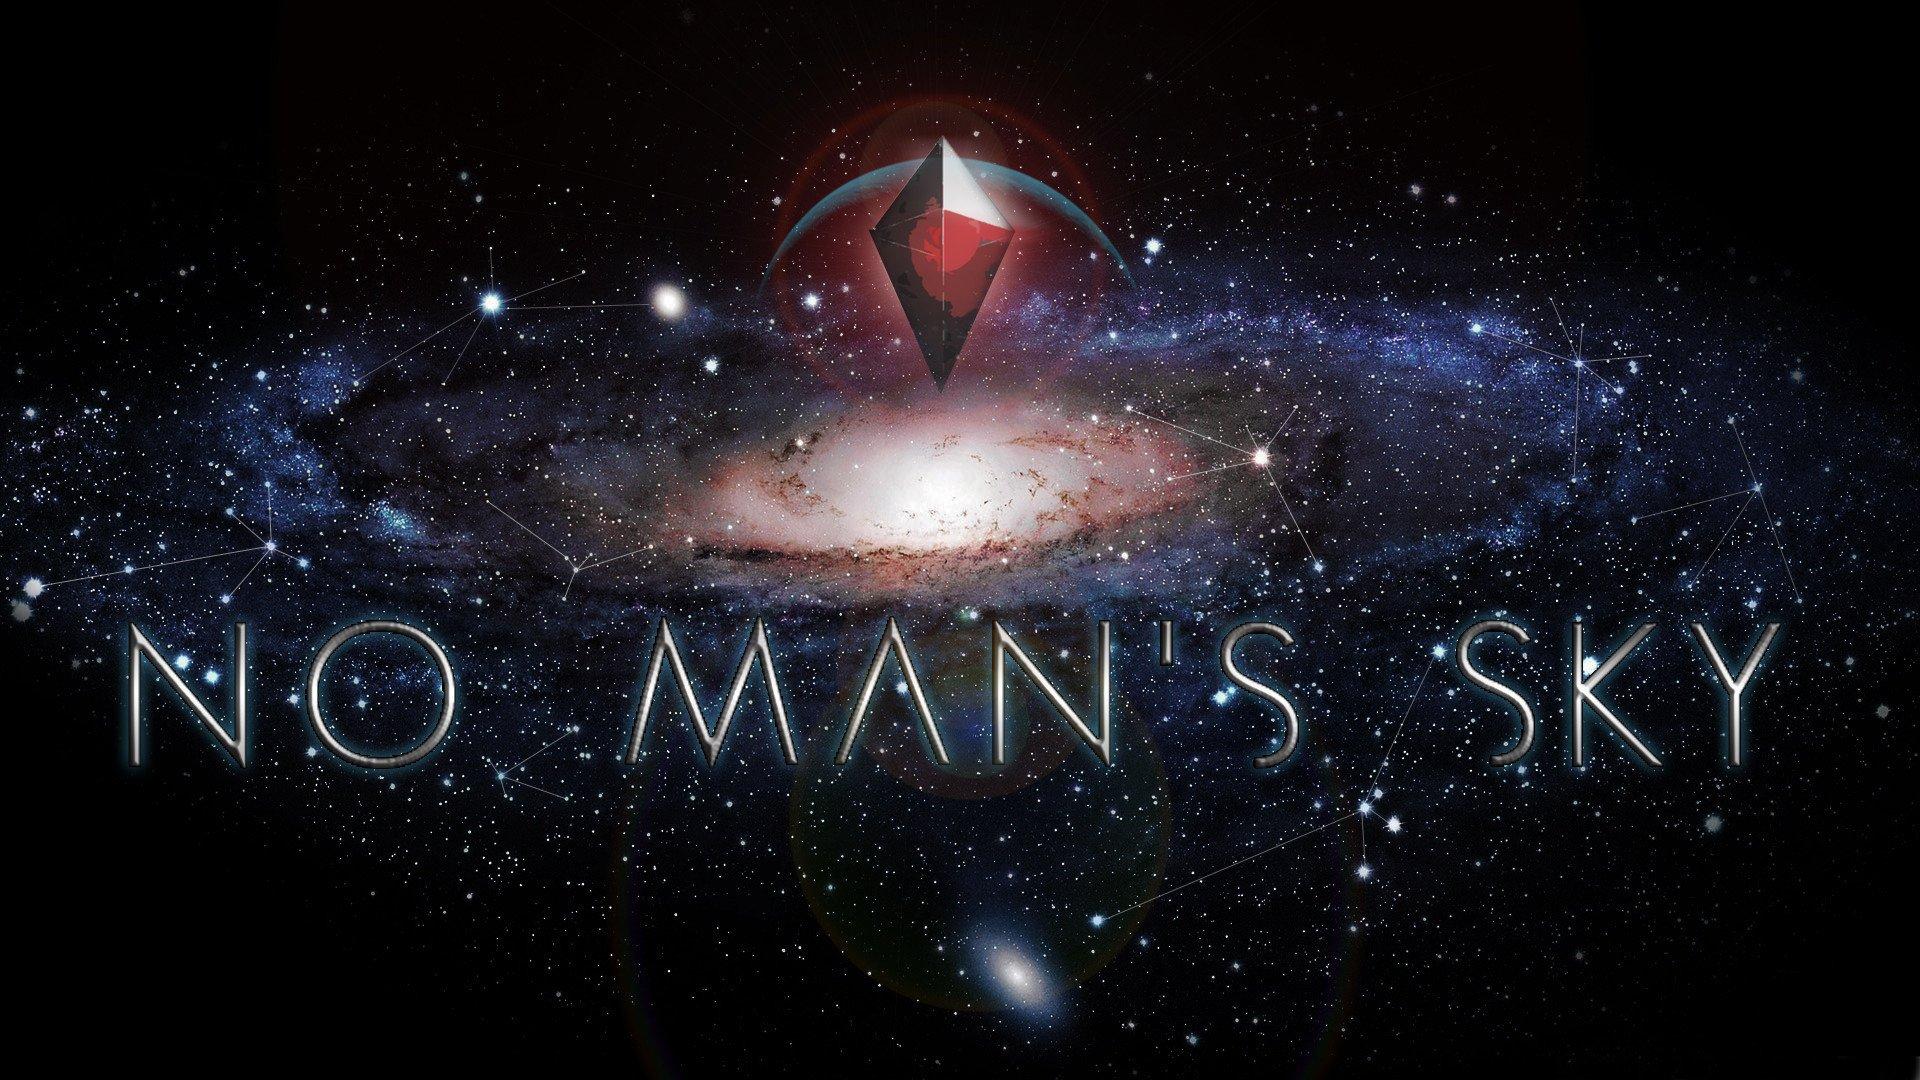 No Man's Sky Full HD Wallpaper 1920x1080 - 20462 - HD ...